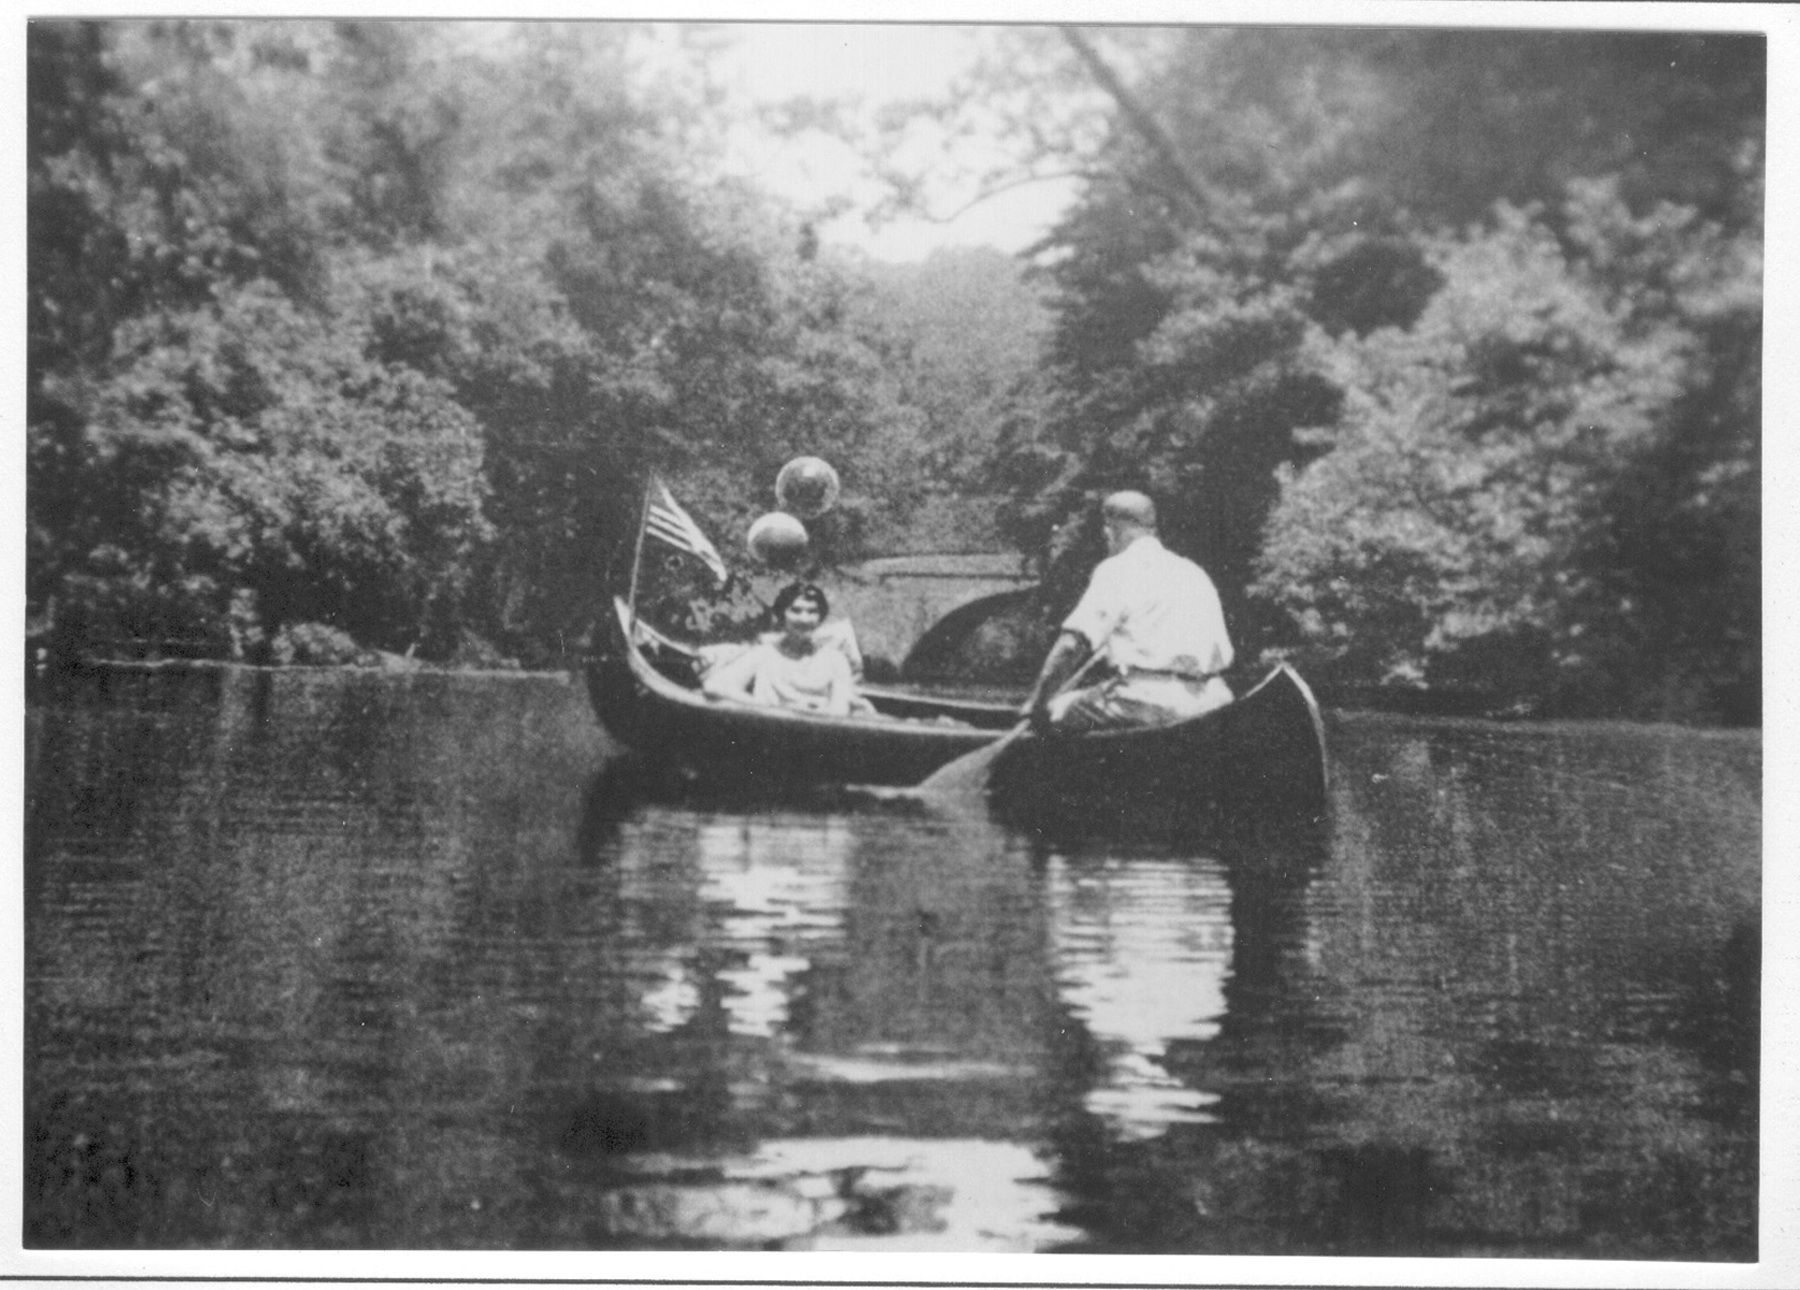 Figure 1. Enjoying the Wissahickon circa 1900 (Francis B. Brandt, The Wissahickon Valley: Within the City of Philadelphia. Philadelphia, Pennsylvania: Corn Exchange National Bank, 1927)